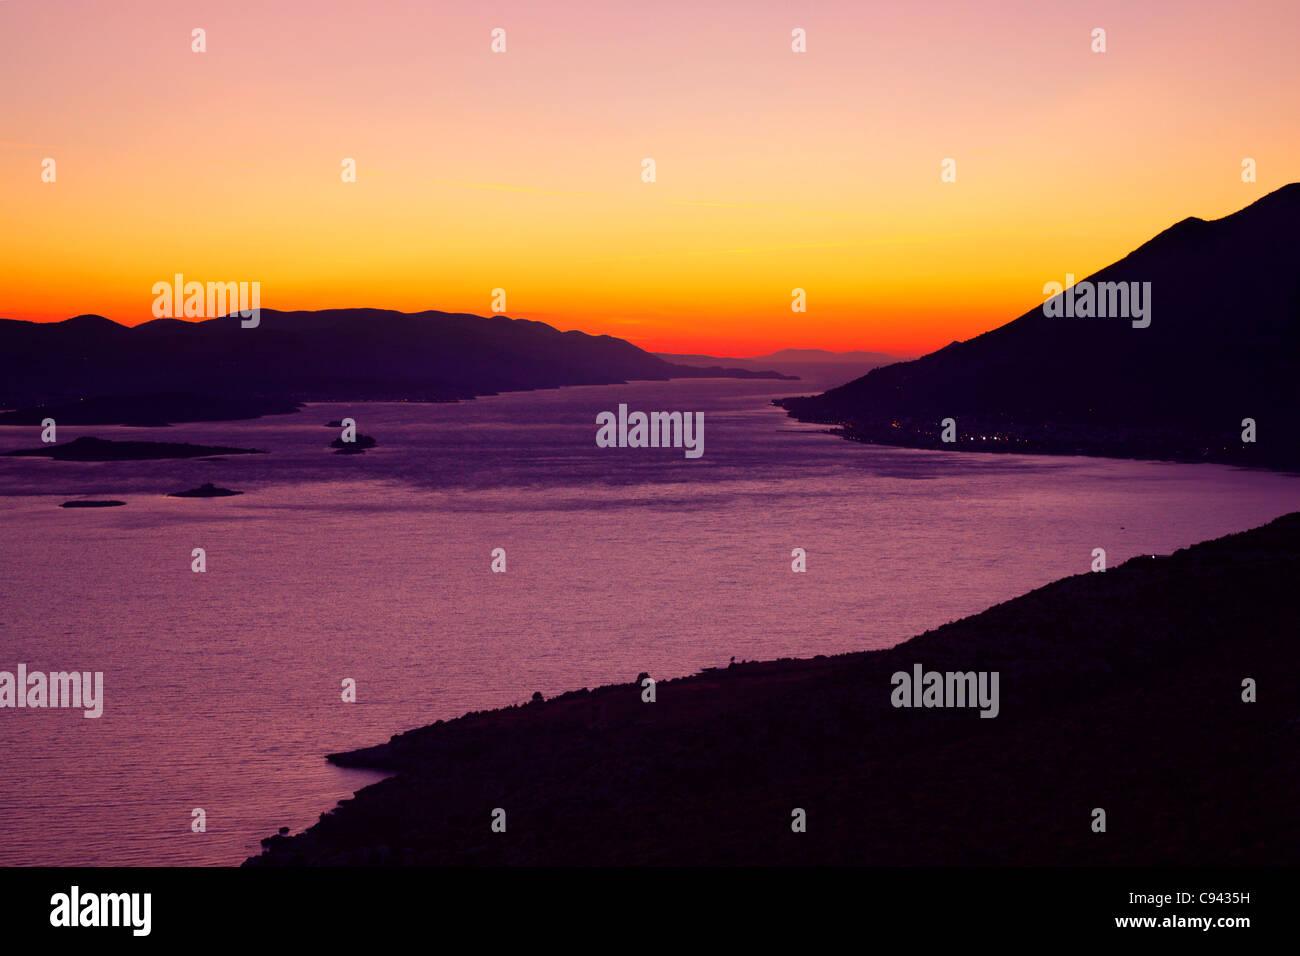 Sonnenuntergang über der Insel Korcula Stockbild